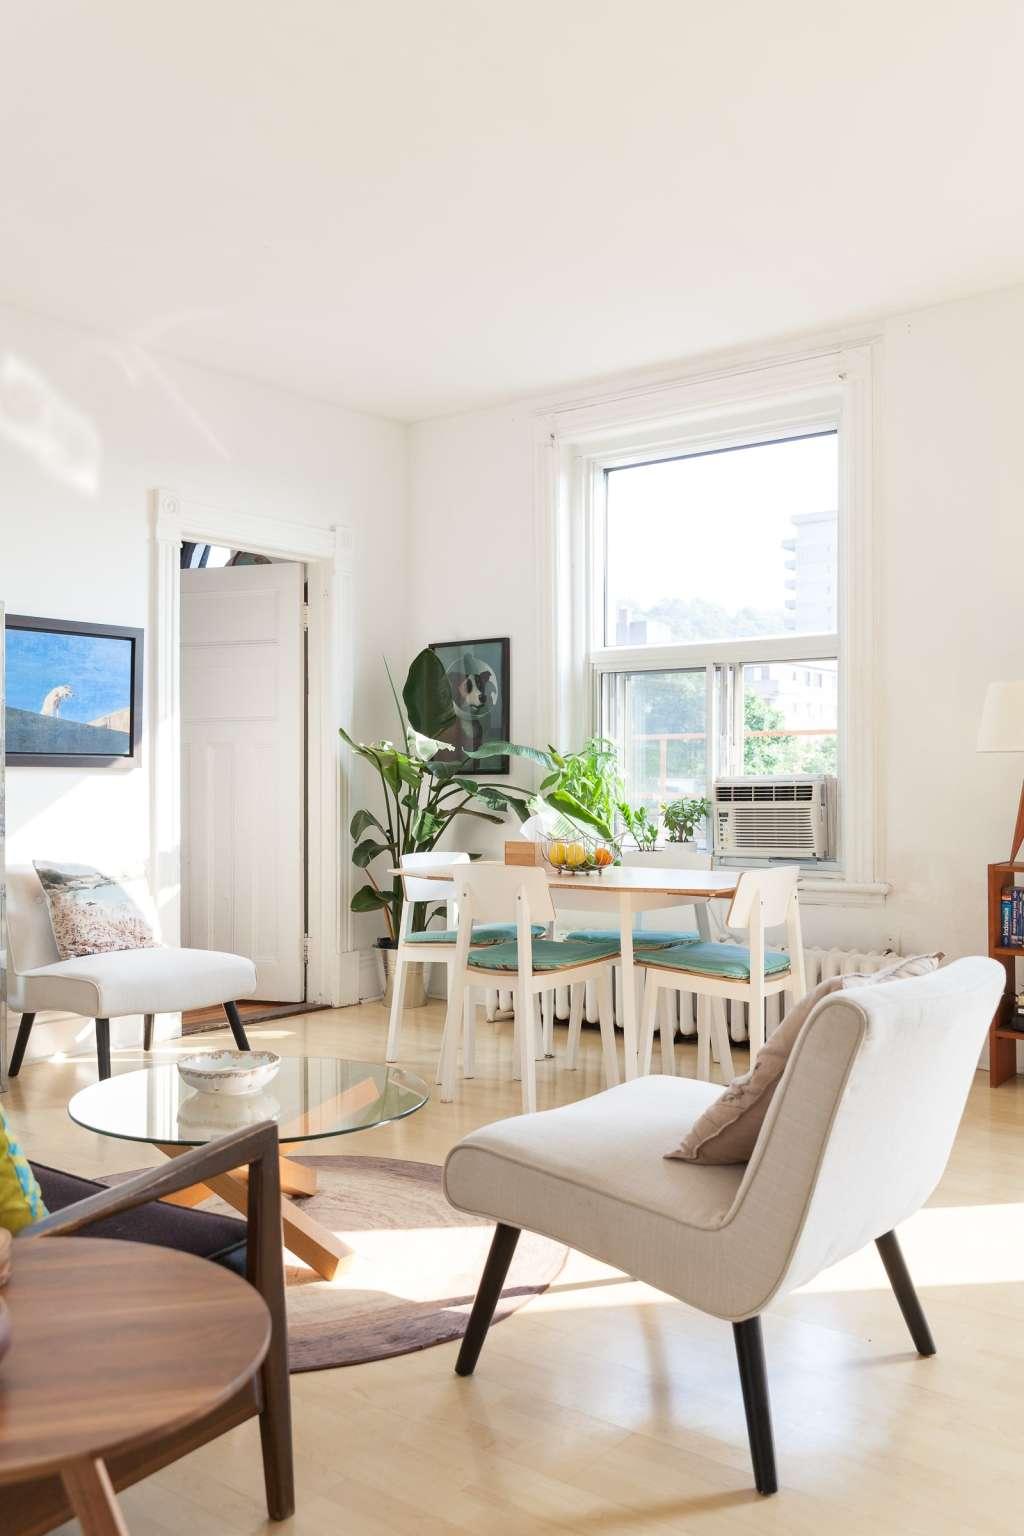 House Tour: Danielle's Bright Top Floor Apartment